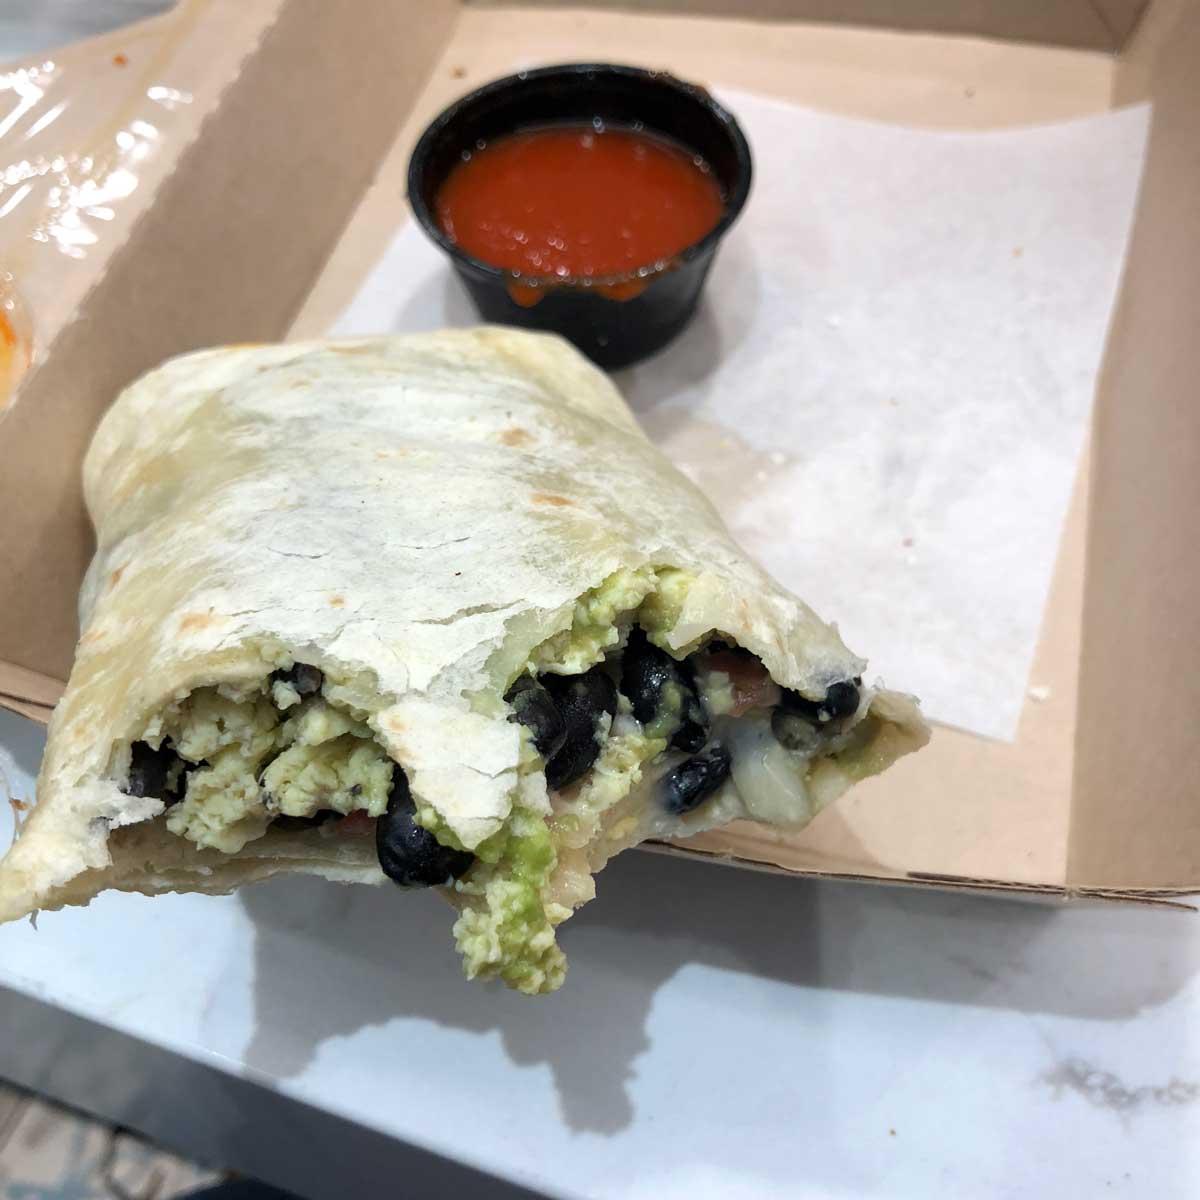 A partially eaten burrito in a to-go container